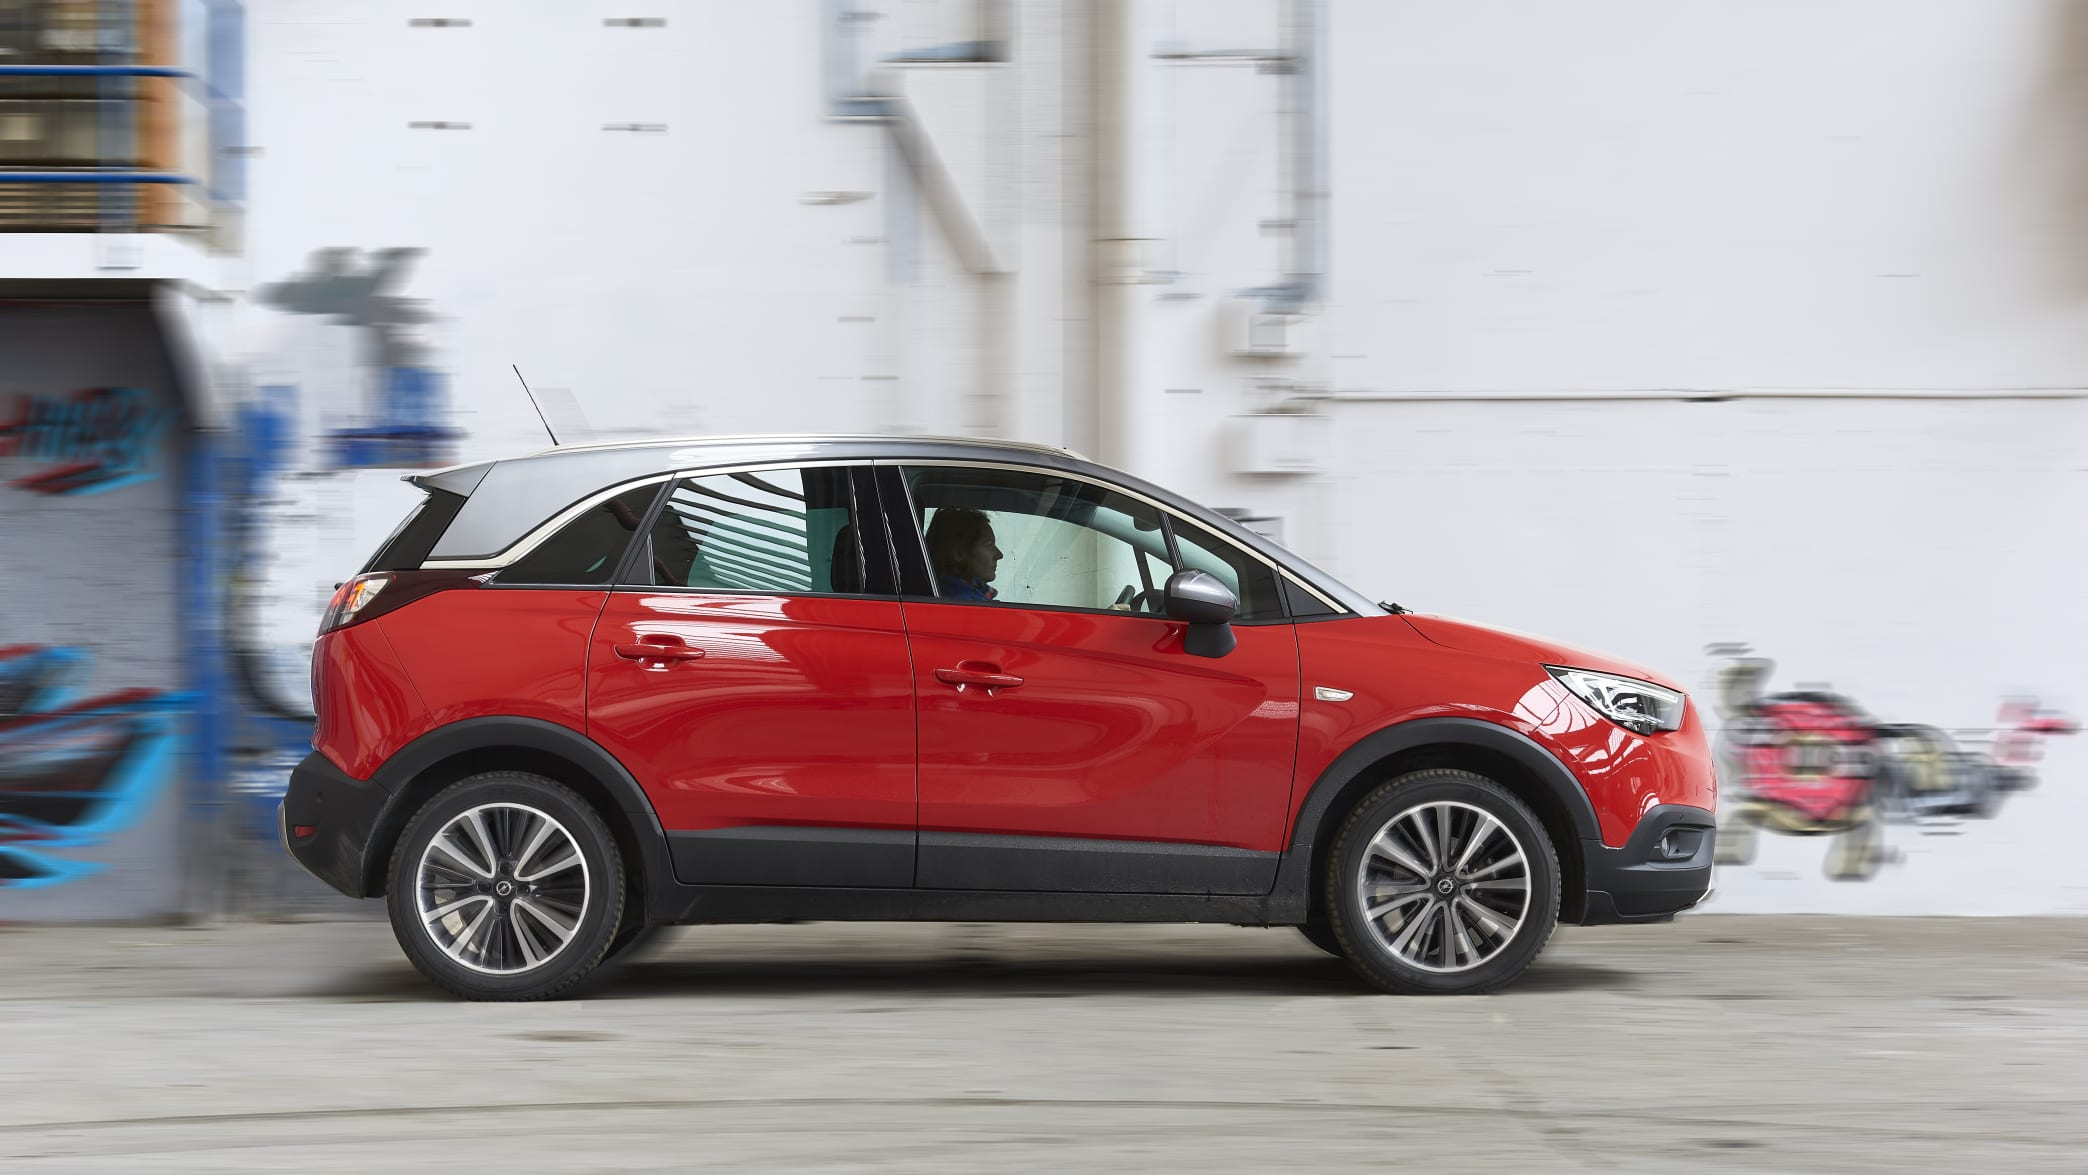 roter Opel Crossland fährt auf Strasse